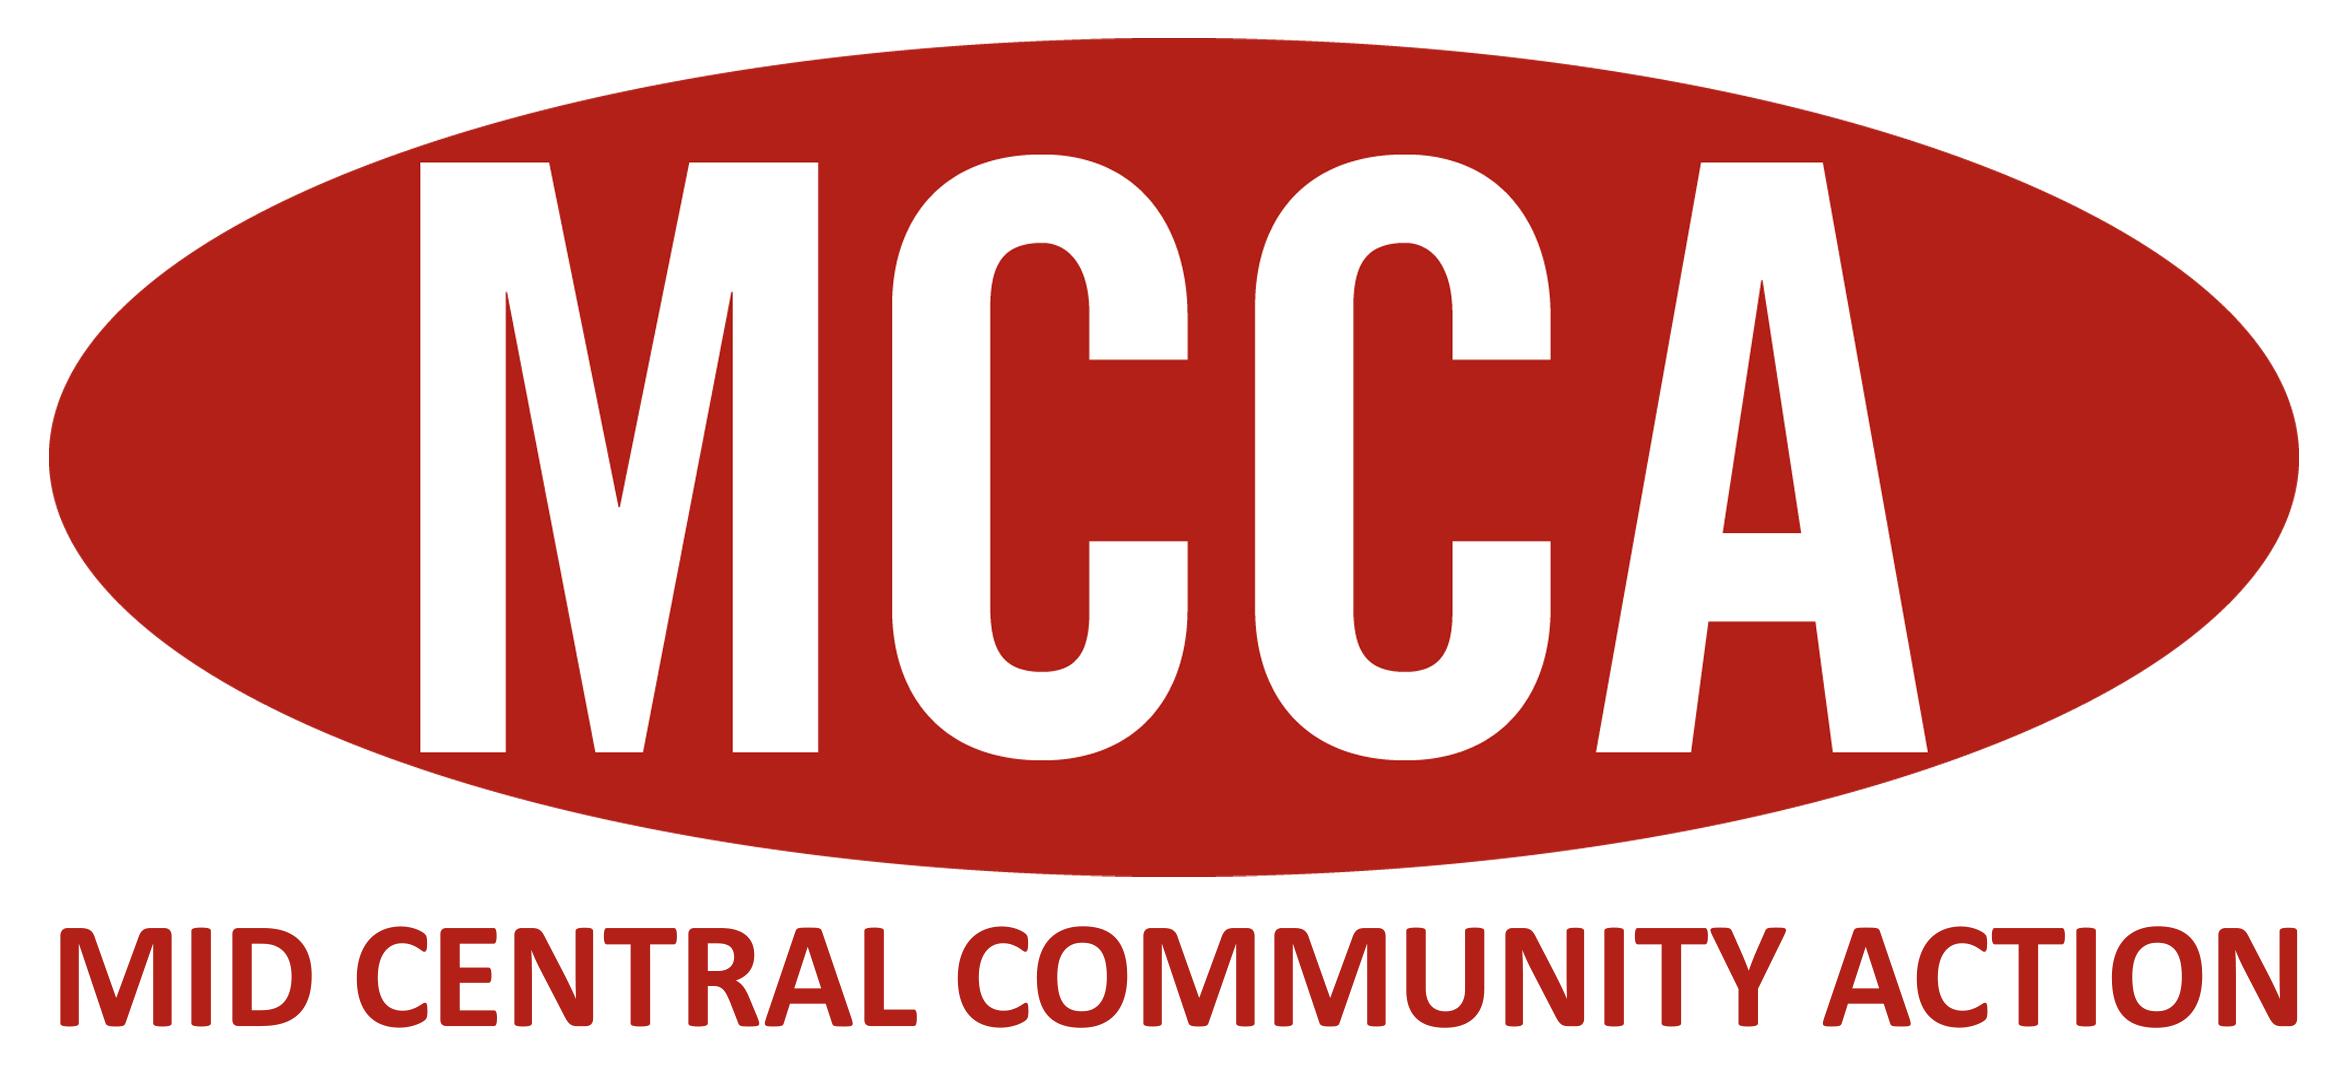 MCCA BN